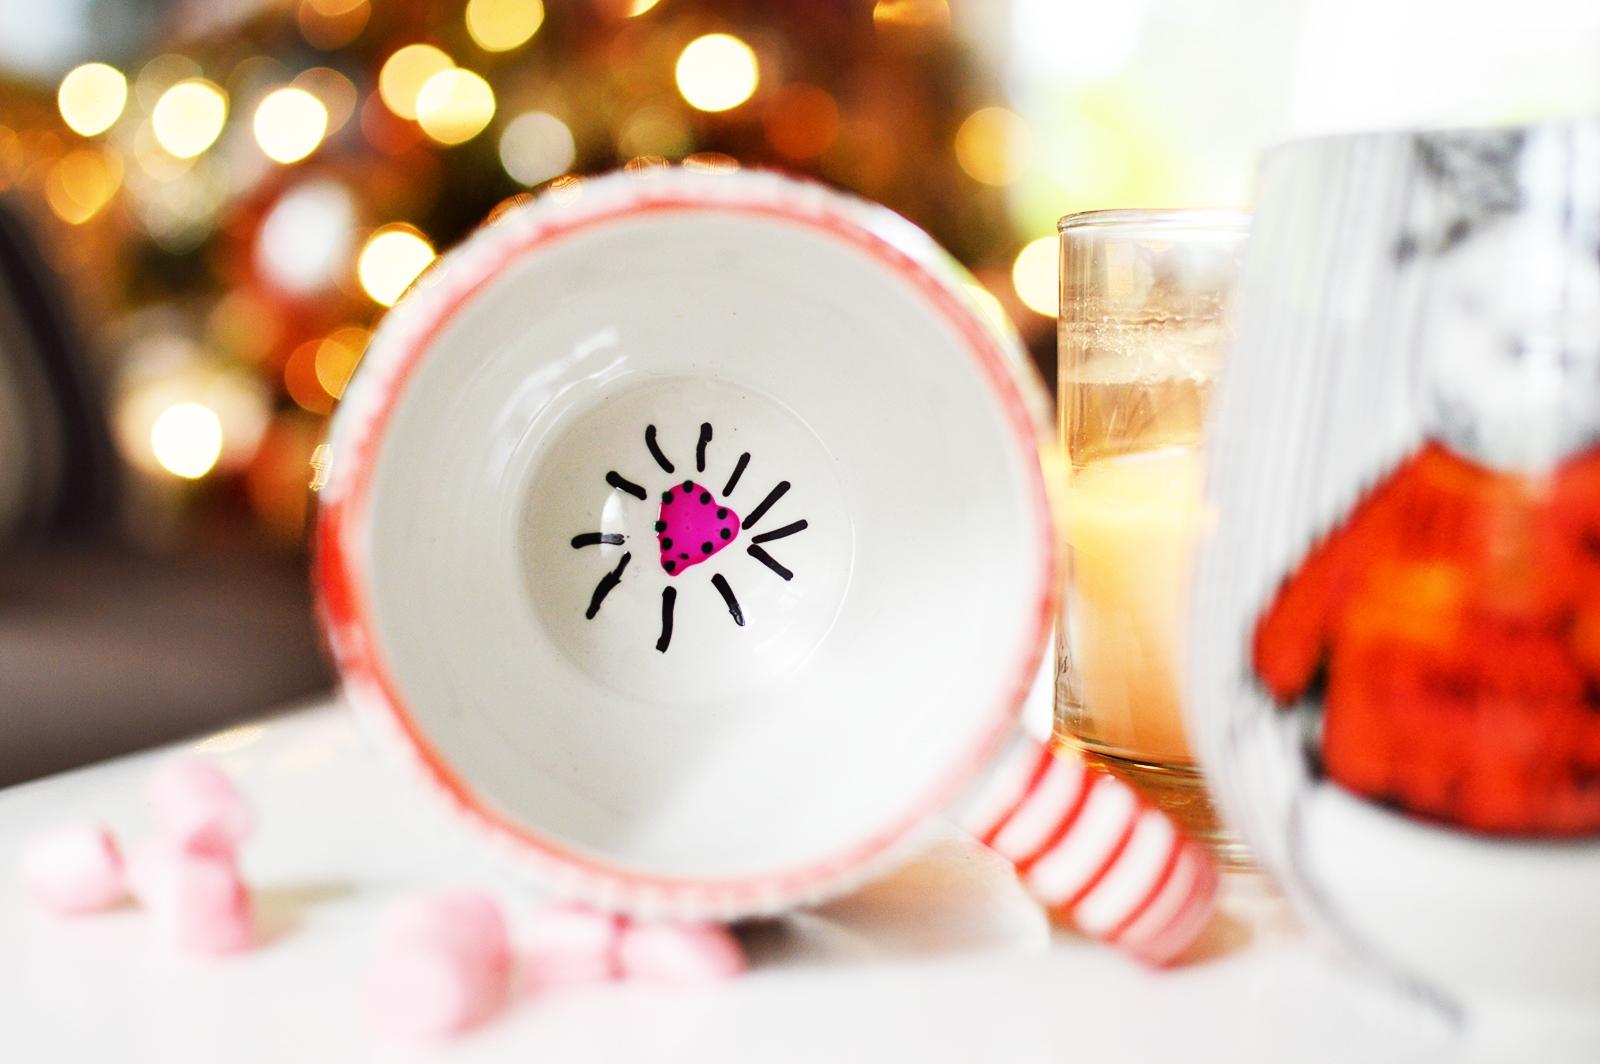 DIY Coffee Mugs - Christmas Mugs - DIY - DIY GIFTS